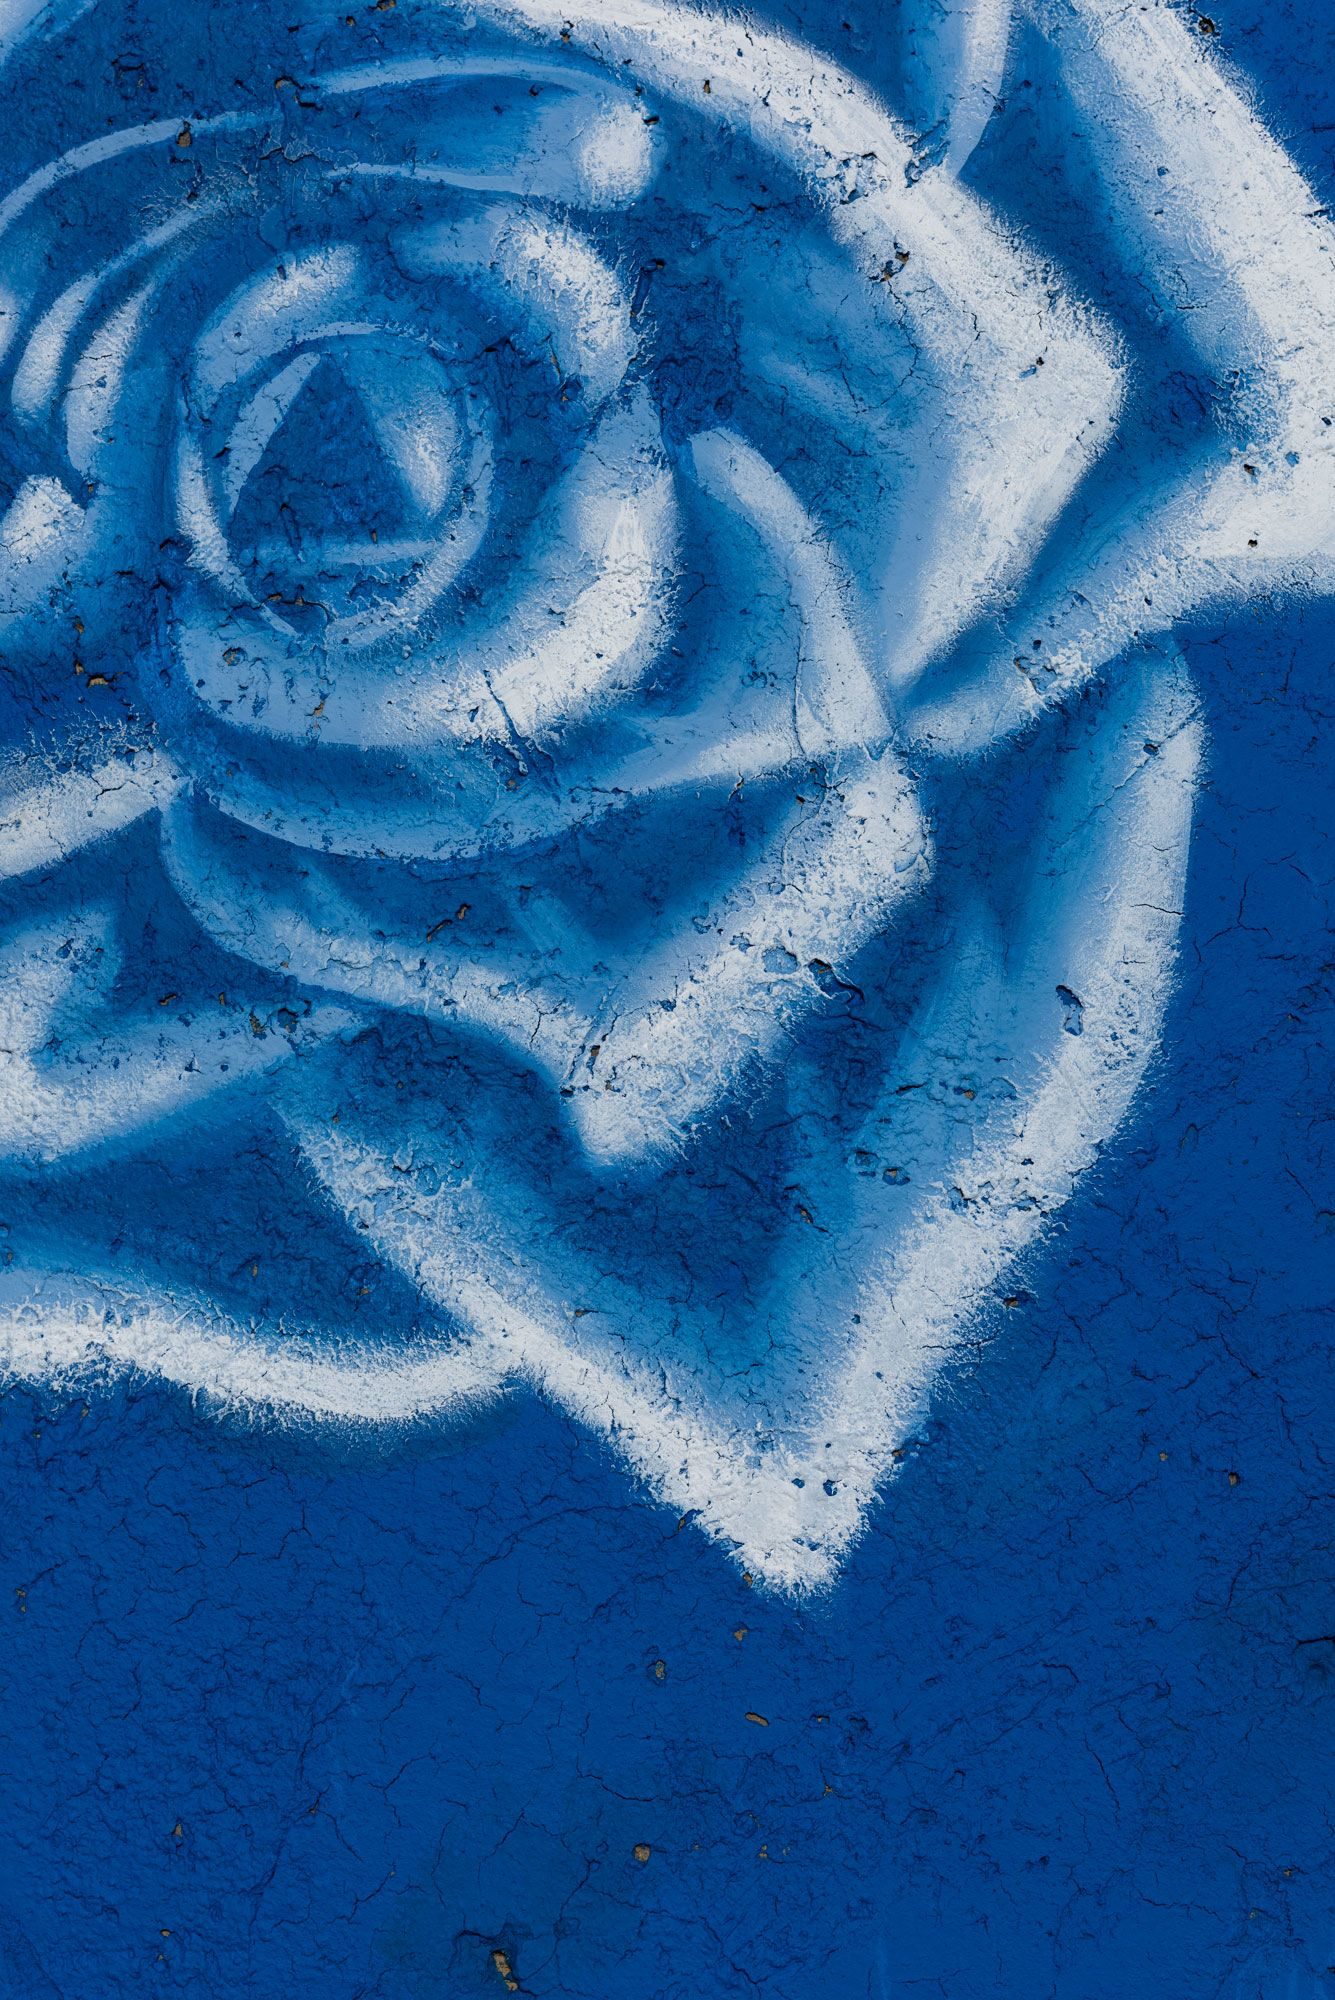 rafa esparza, starshots: blue roses, 2019-20